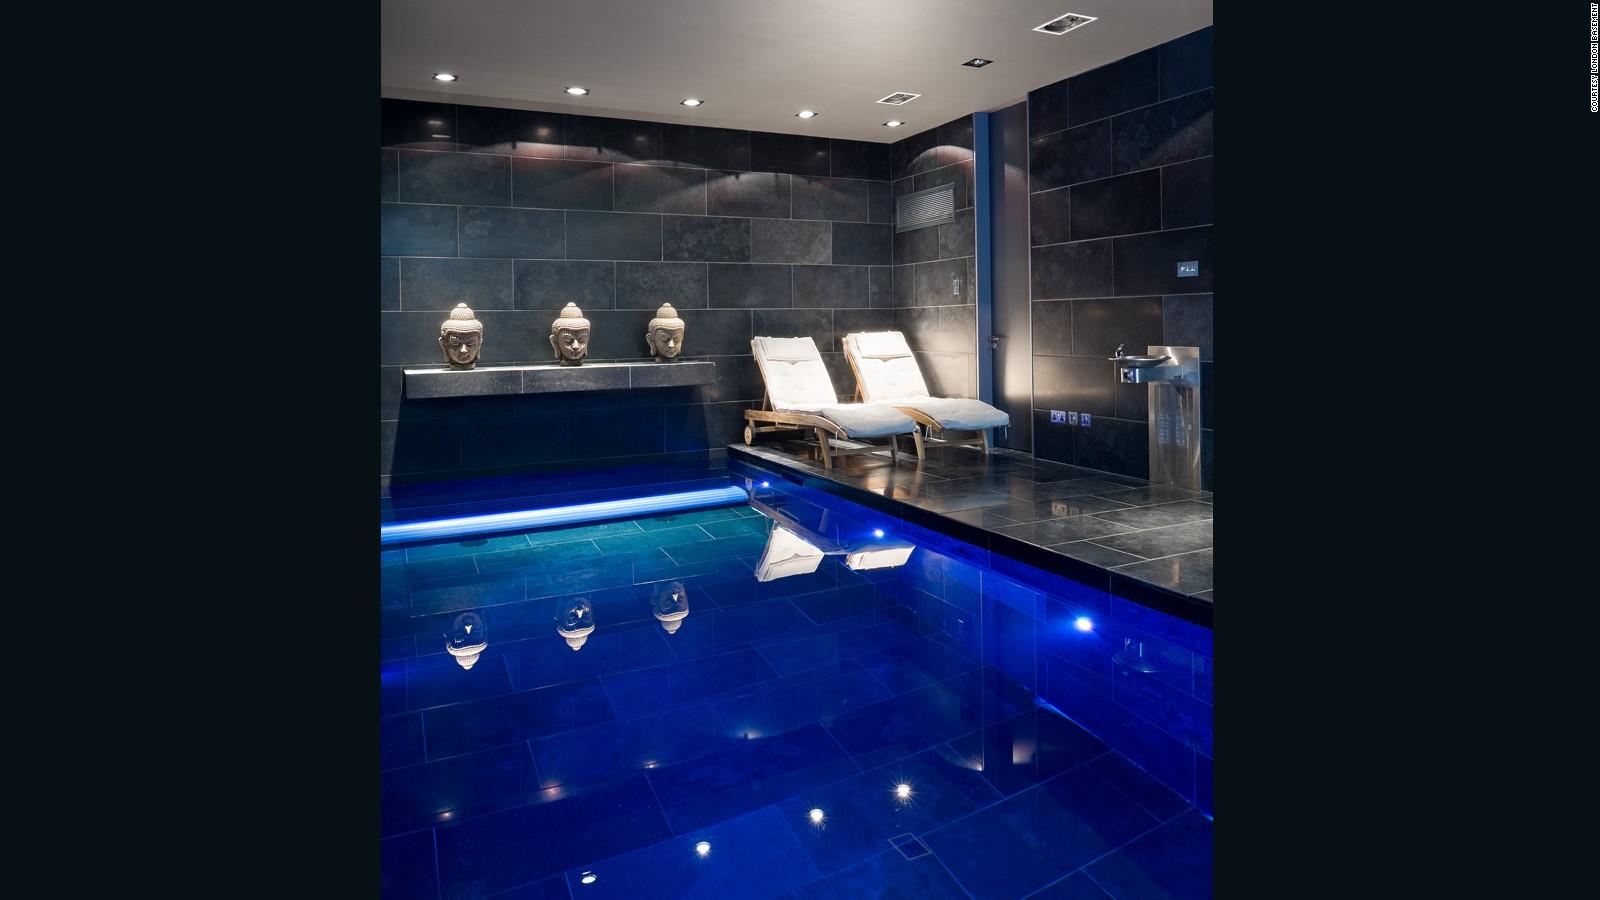 Swimming Pool In The Basement Home Desain 2018